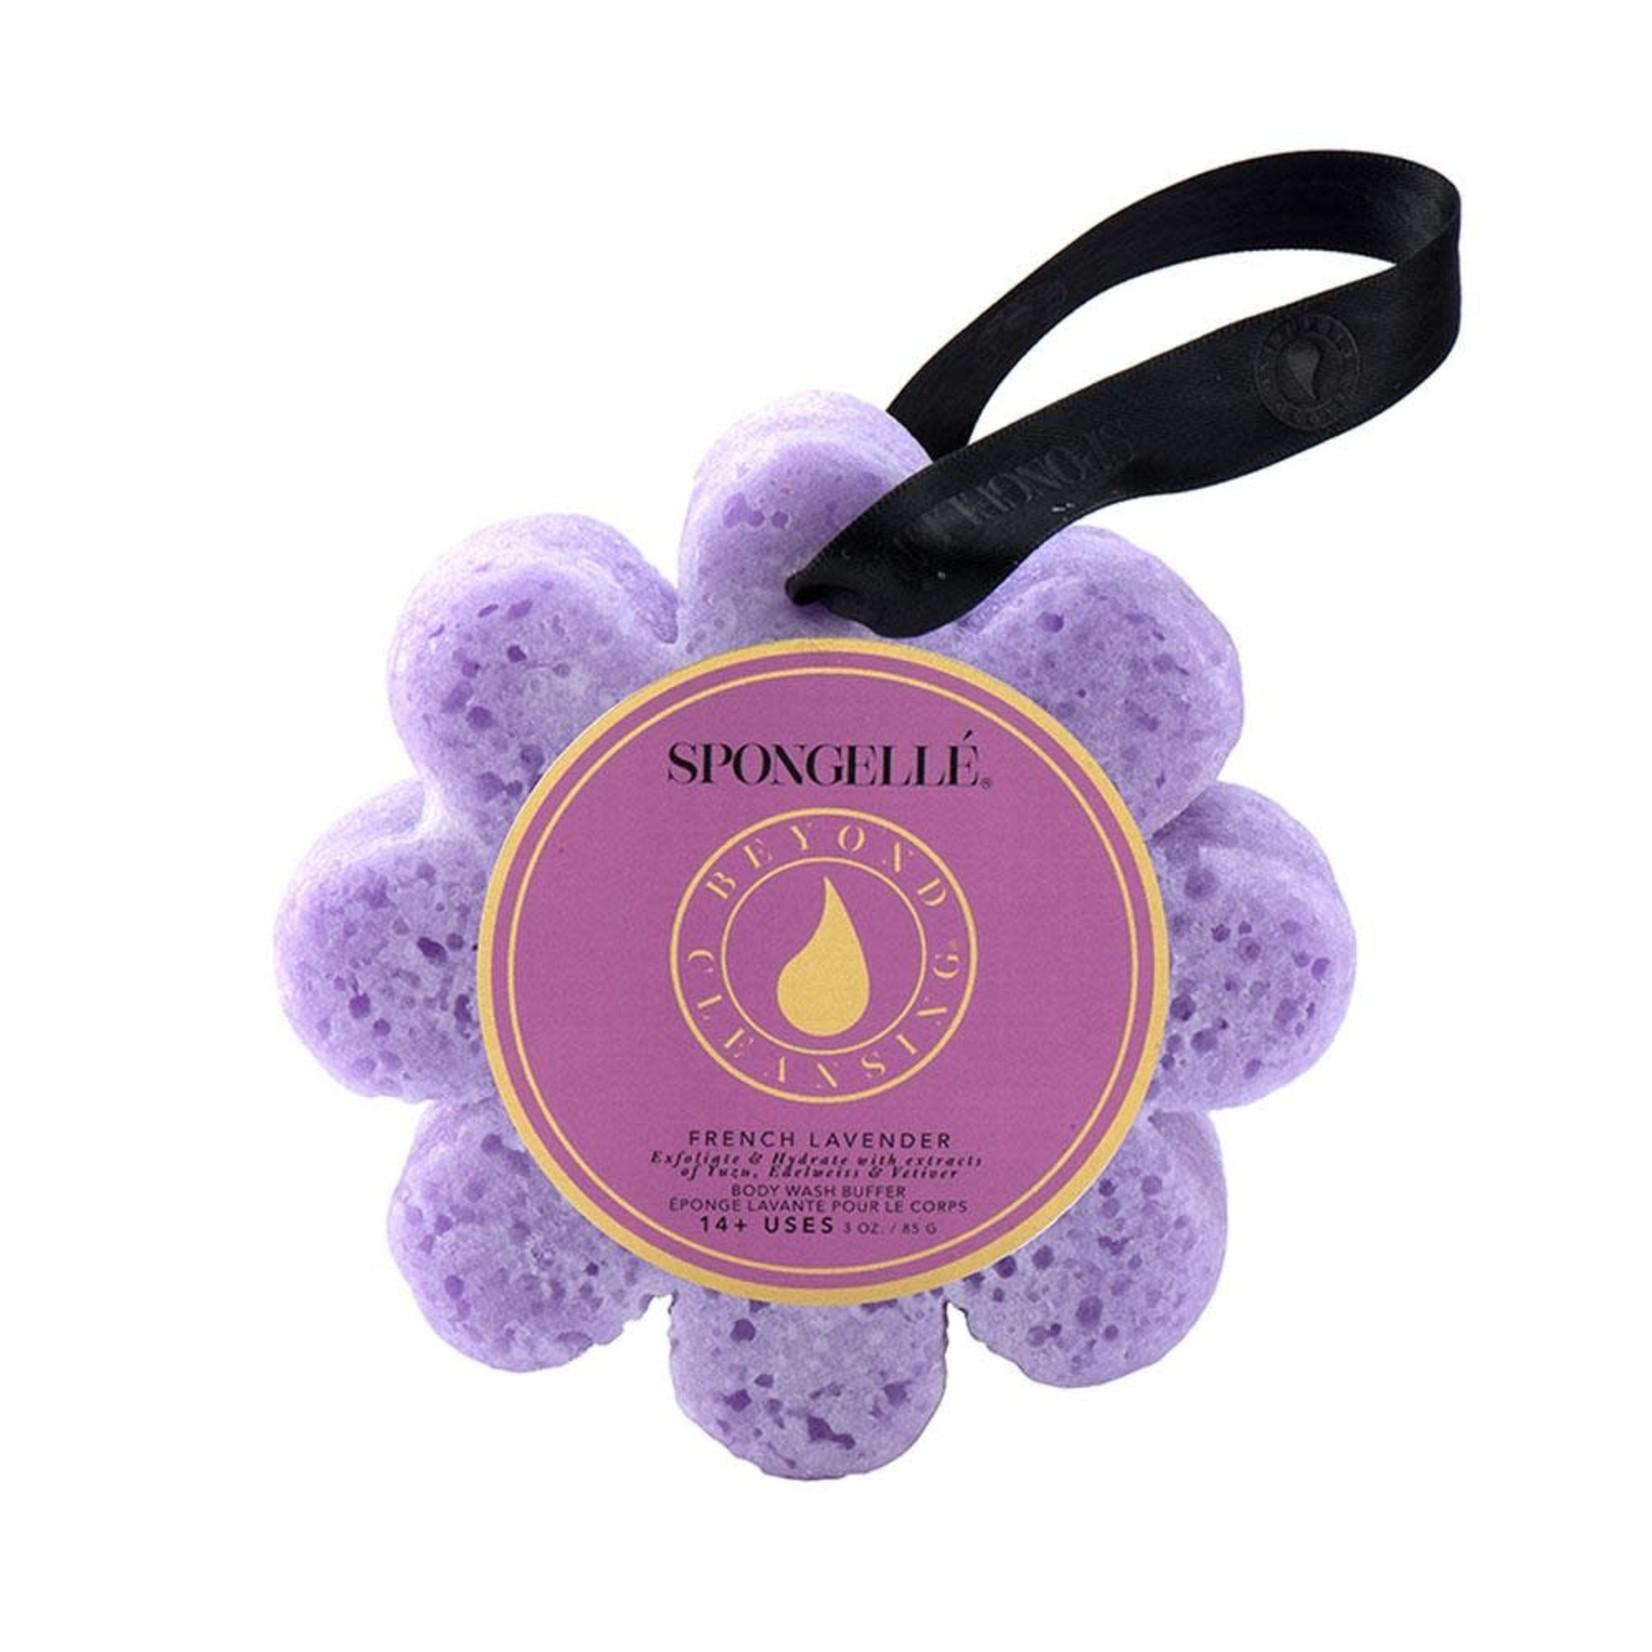 Spongelle French Lavender | Wild Flower Bath Sponge